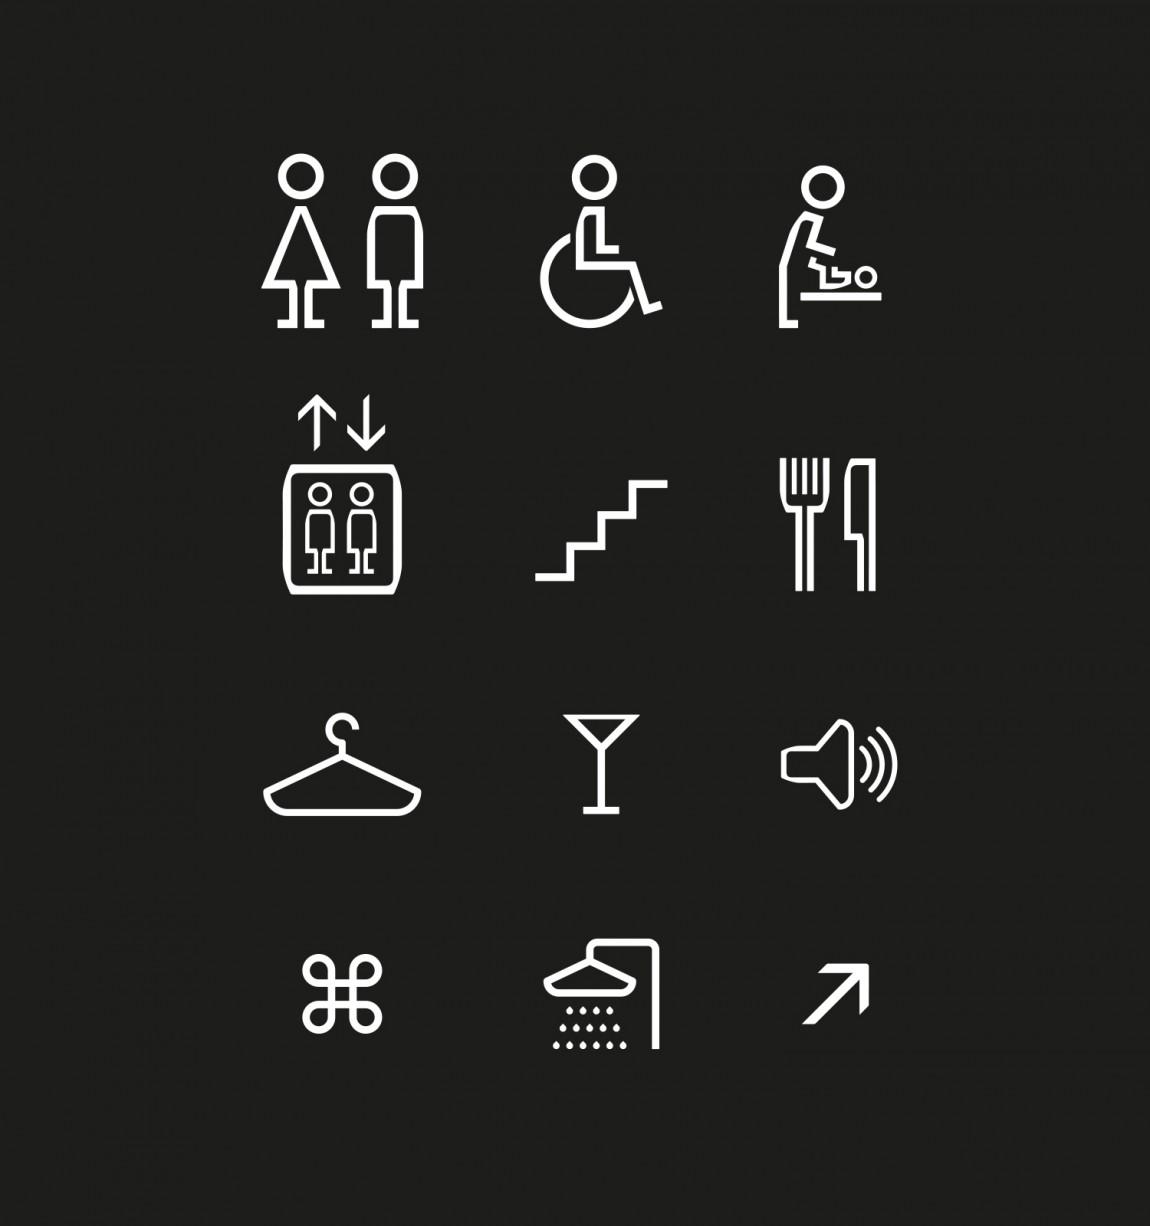 Sentralen文化中心vi企业形象设计, 导视系统设计